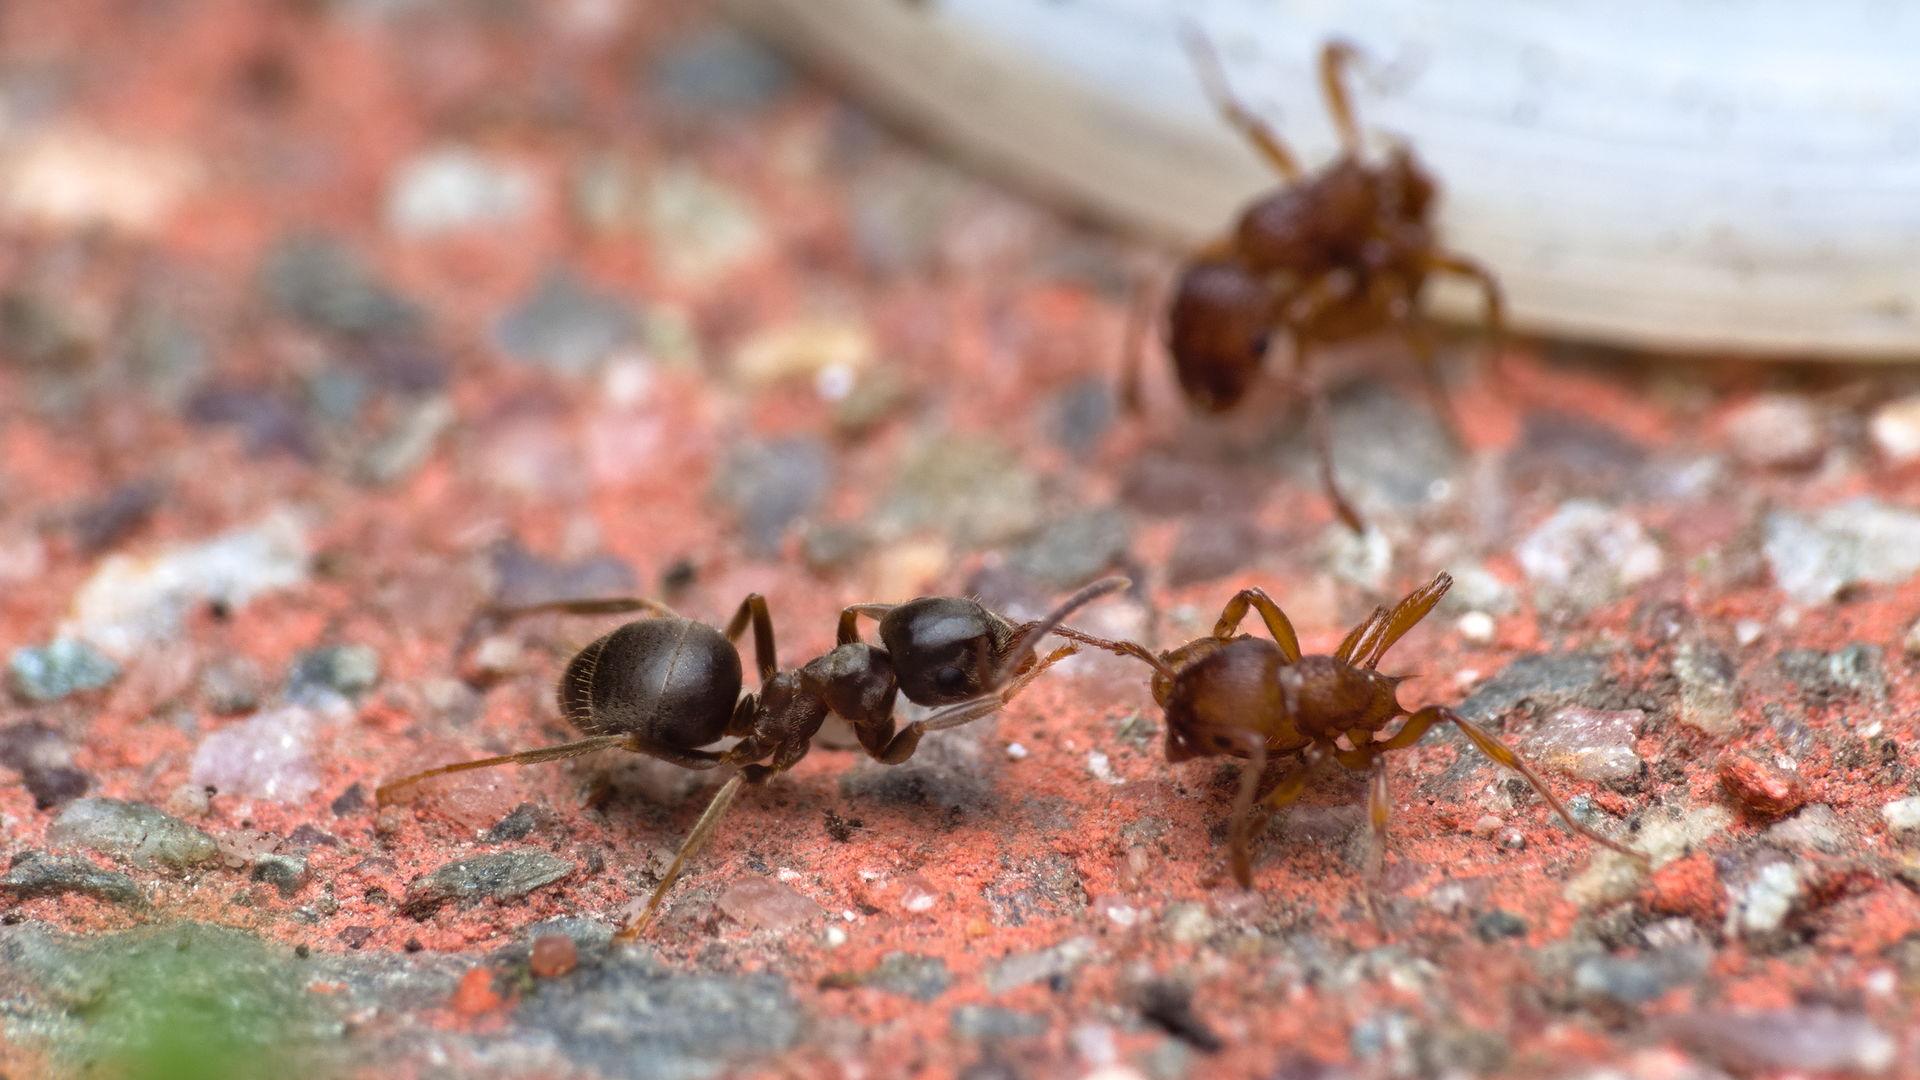 Lasius cf. niger vs Myrmica sp.